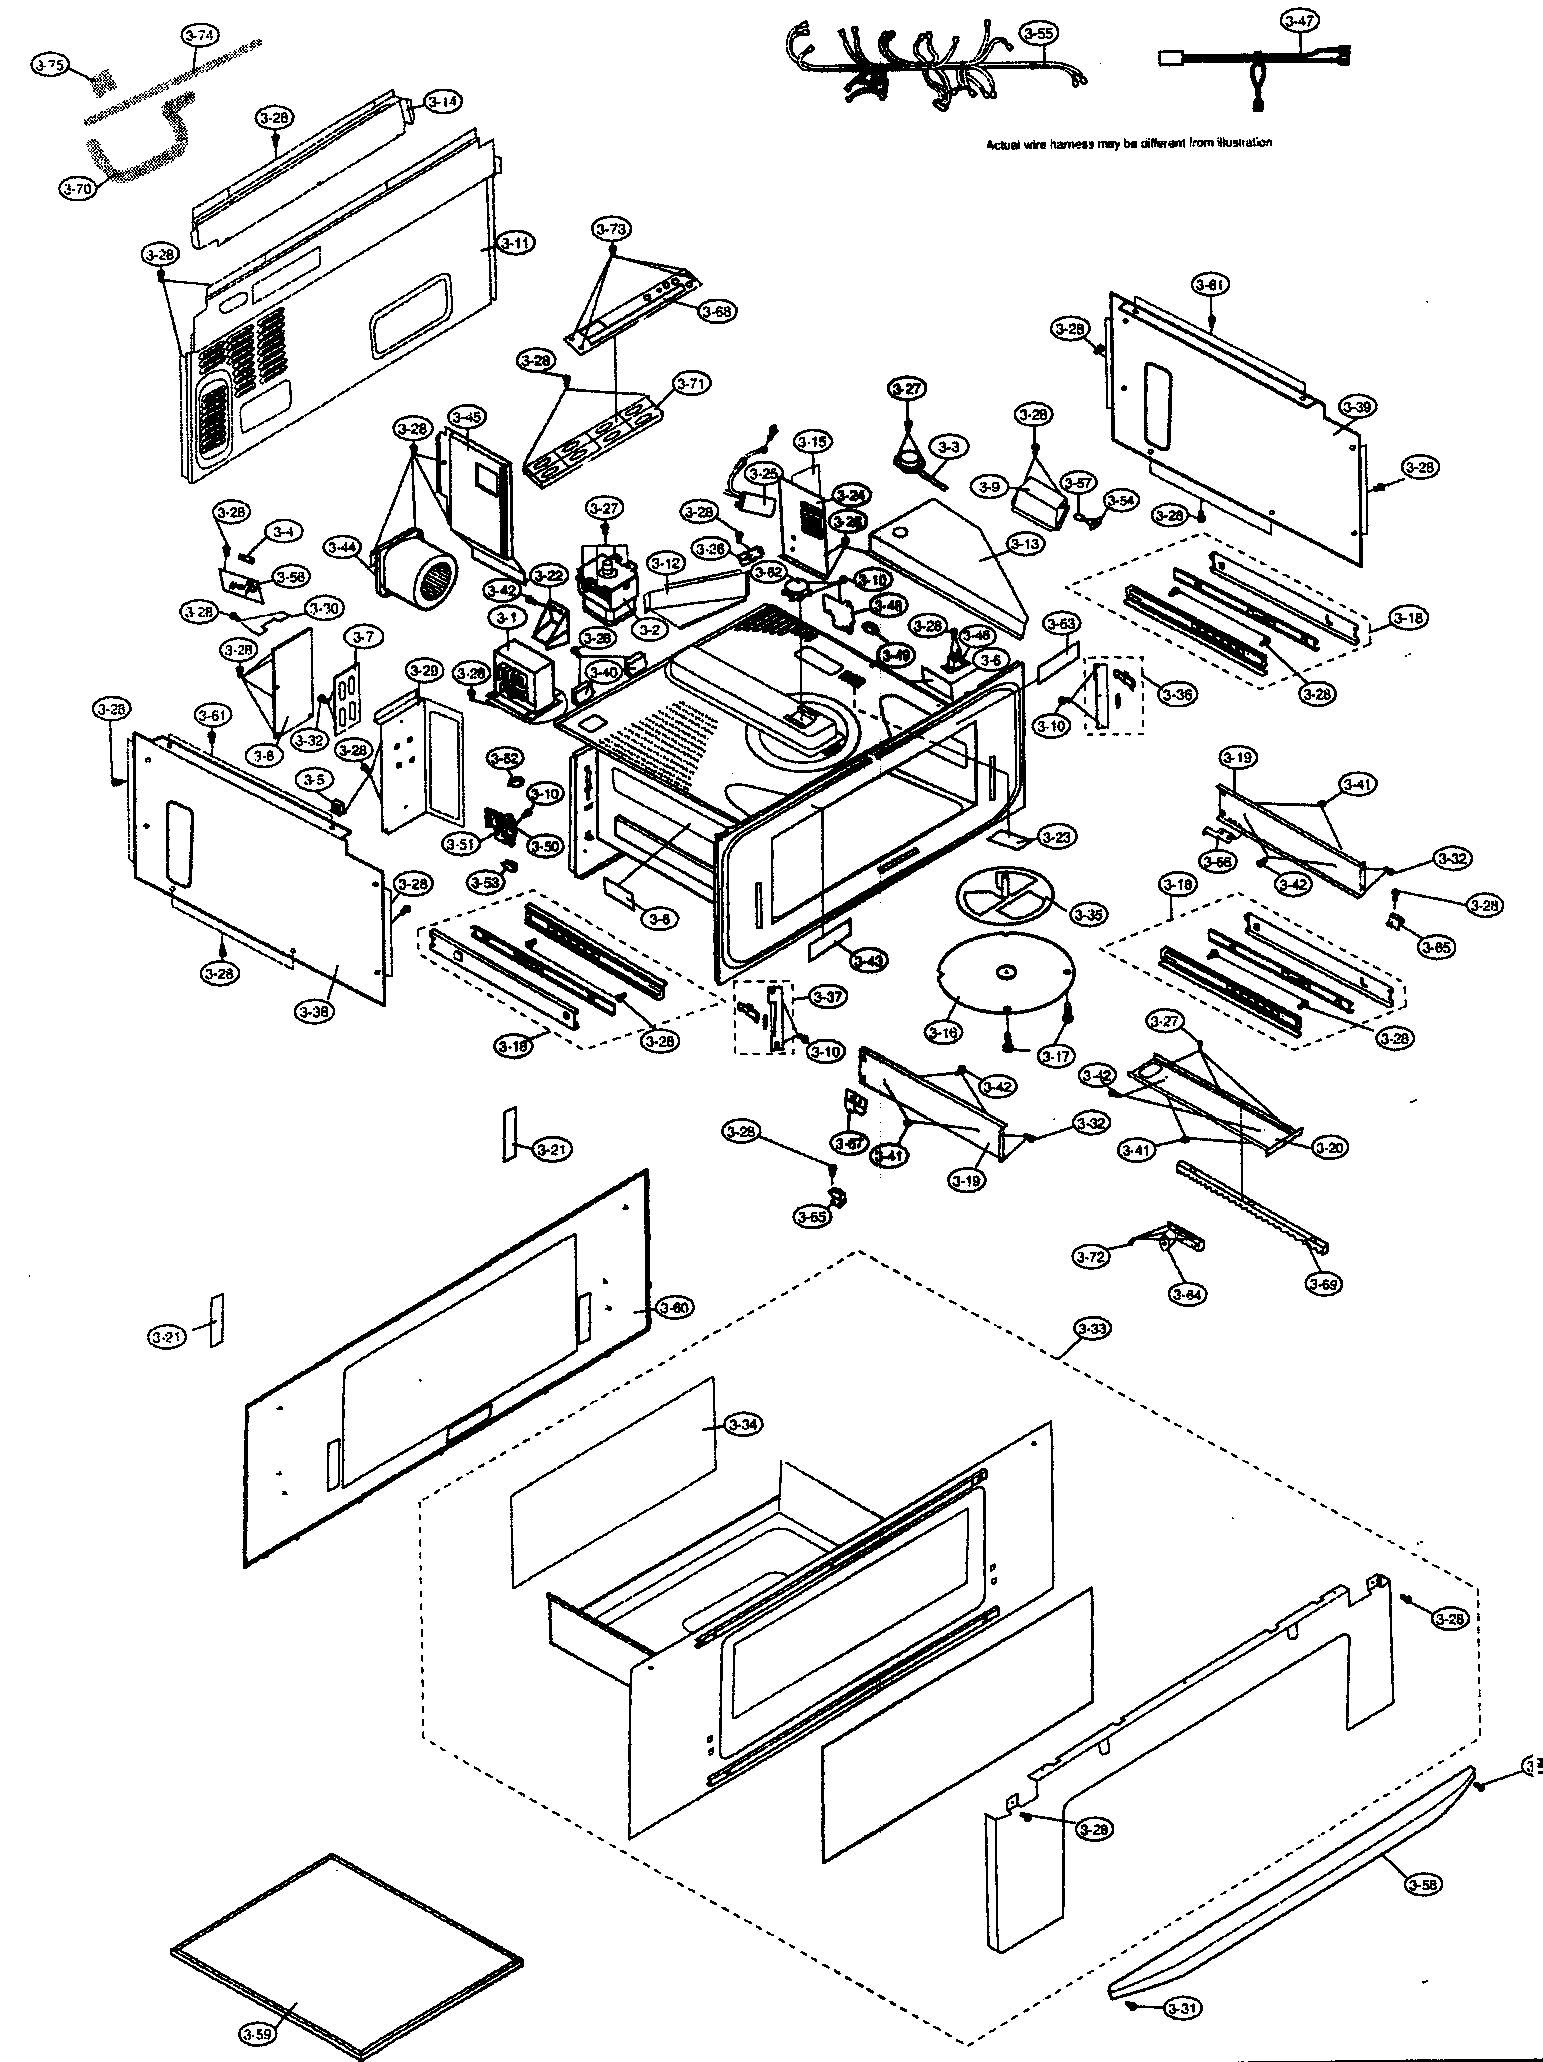 2001 mazda tribute serpentine belt diagram 91 crx radio wiring engine library